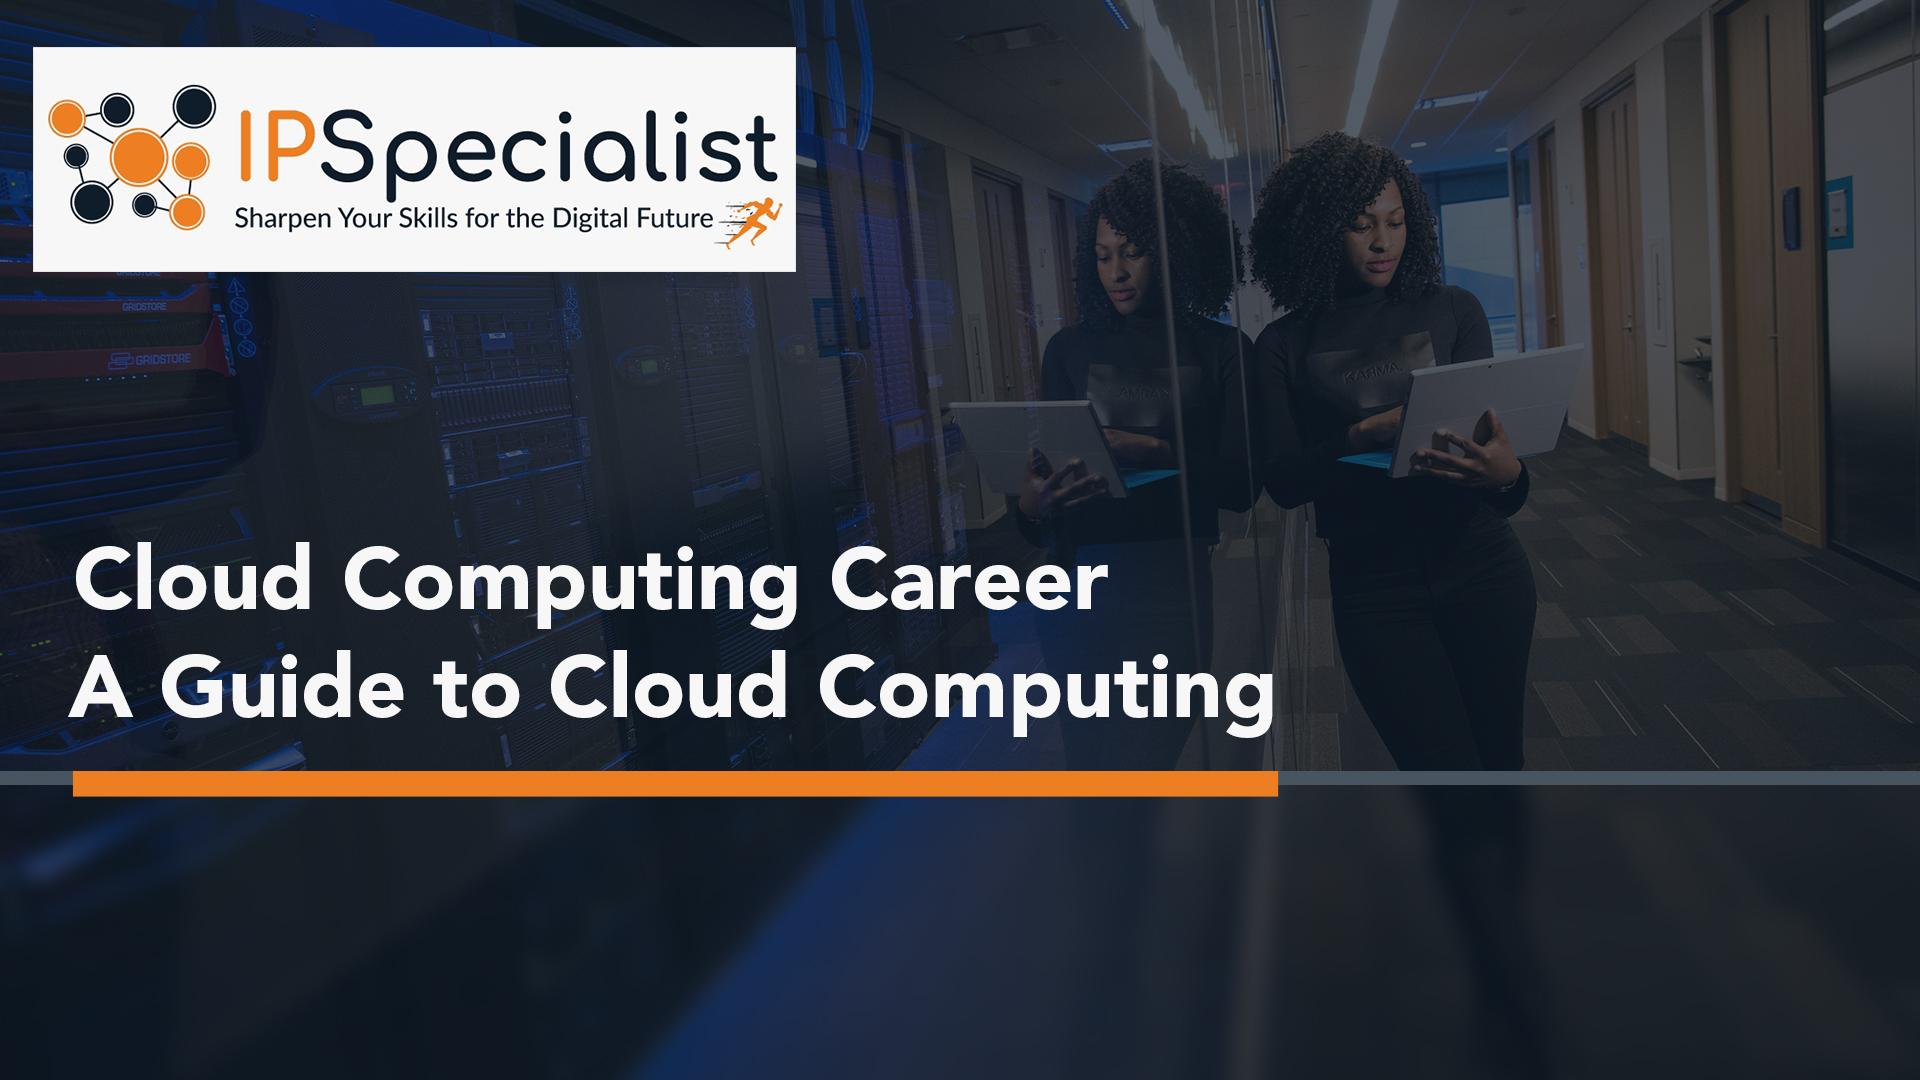 Cloud computing career